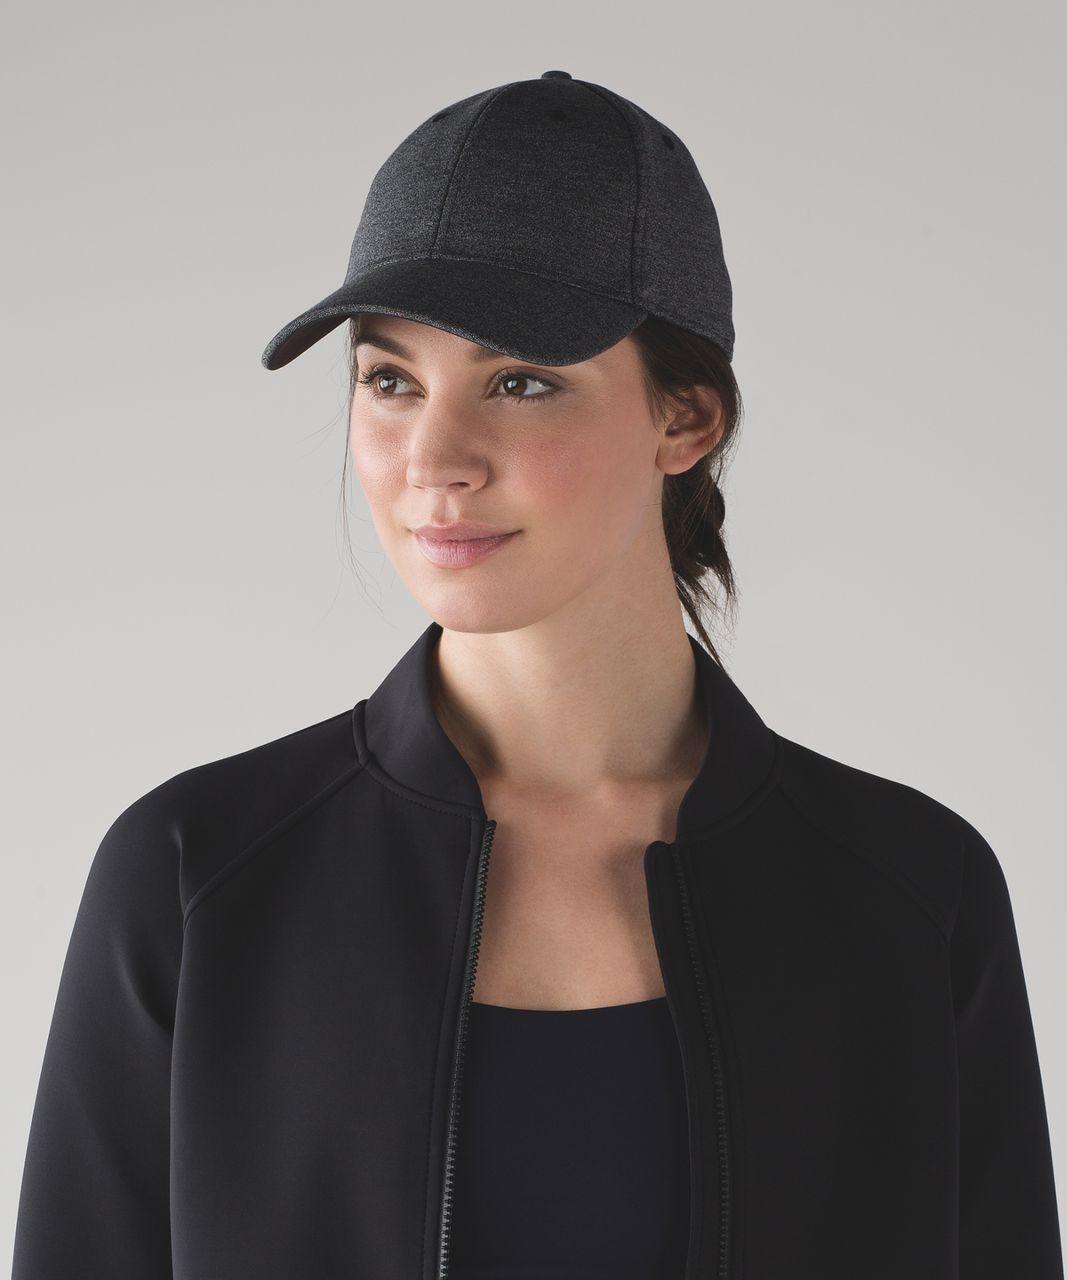 Lululemon Baller Hat - Heathered Black